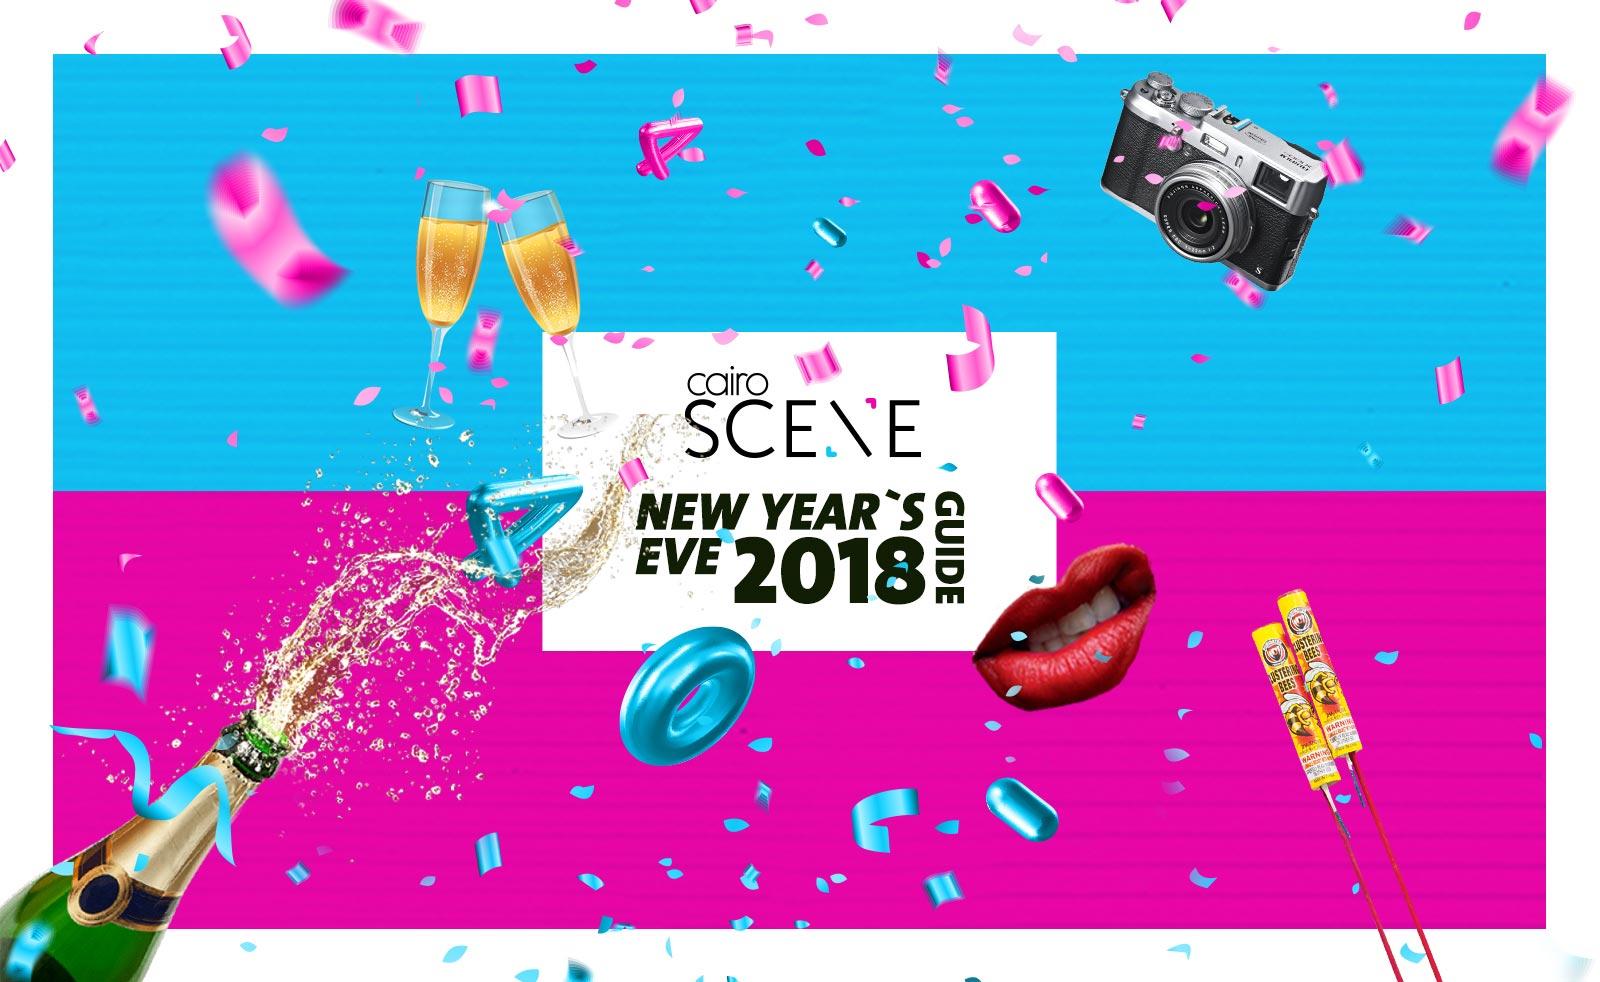 CairoScene New Year's Guide 2019